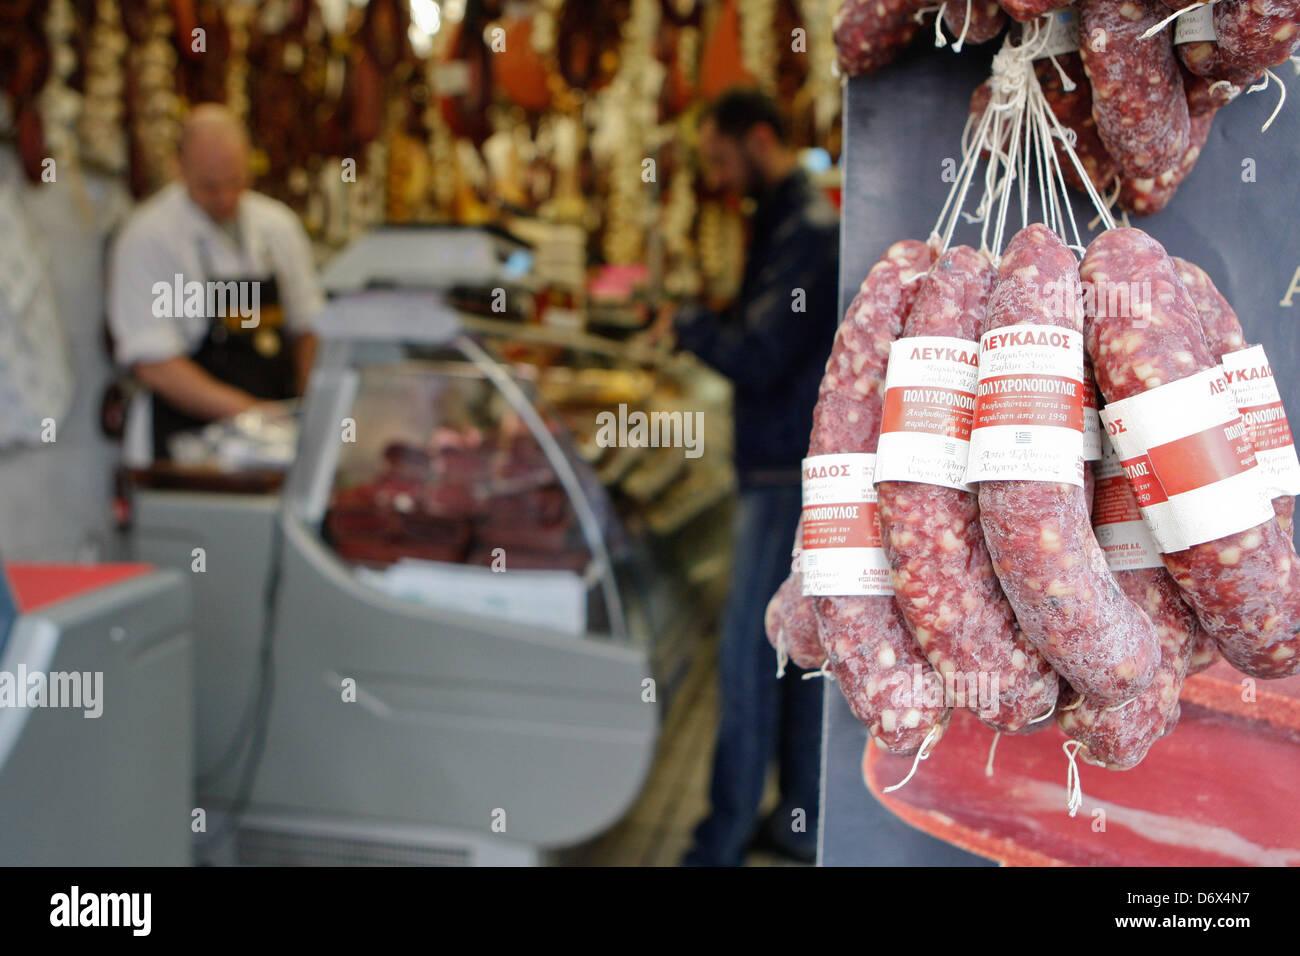 April 24, 2013 - Athens, Greece - Delicatessen butcher's sell Pastırma or bastirma or basturma is a highly seasoned, Stock Photo